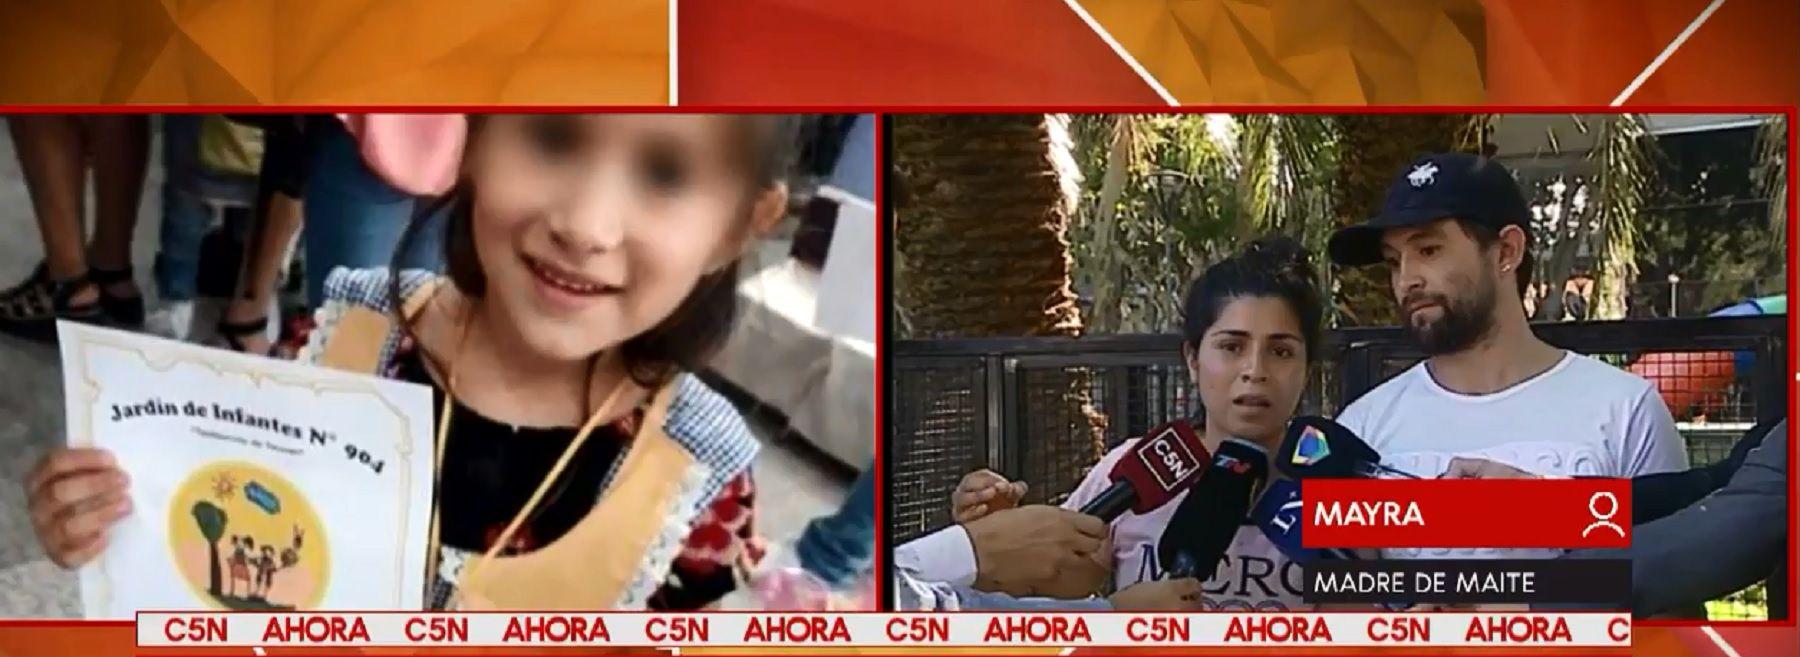 Maite, la nena baleada, tiene muerte encefálica: Lamentablemente mi hija falleció